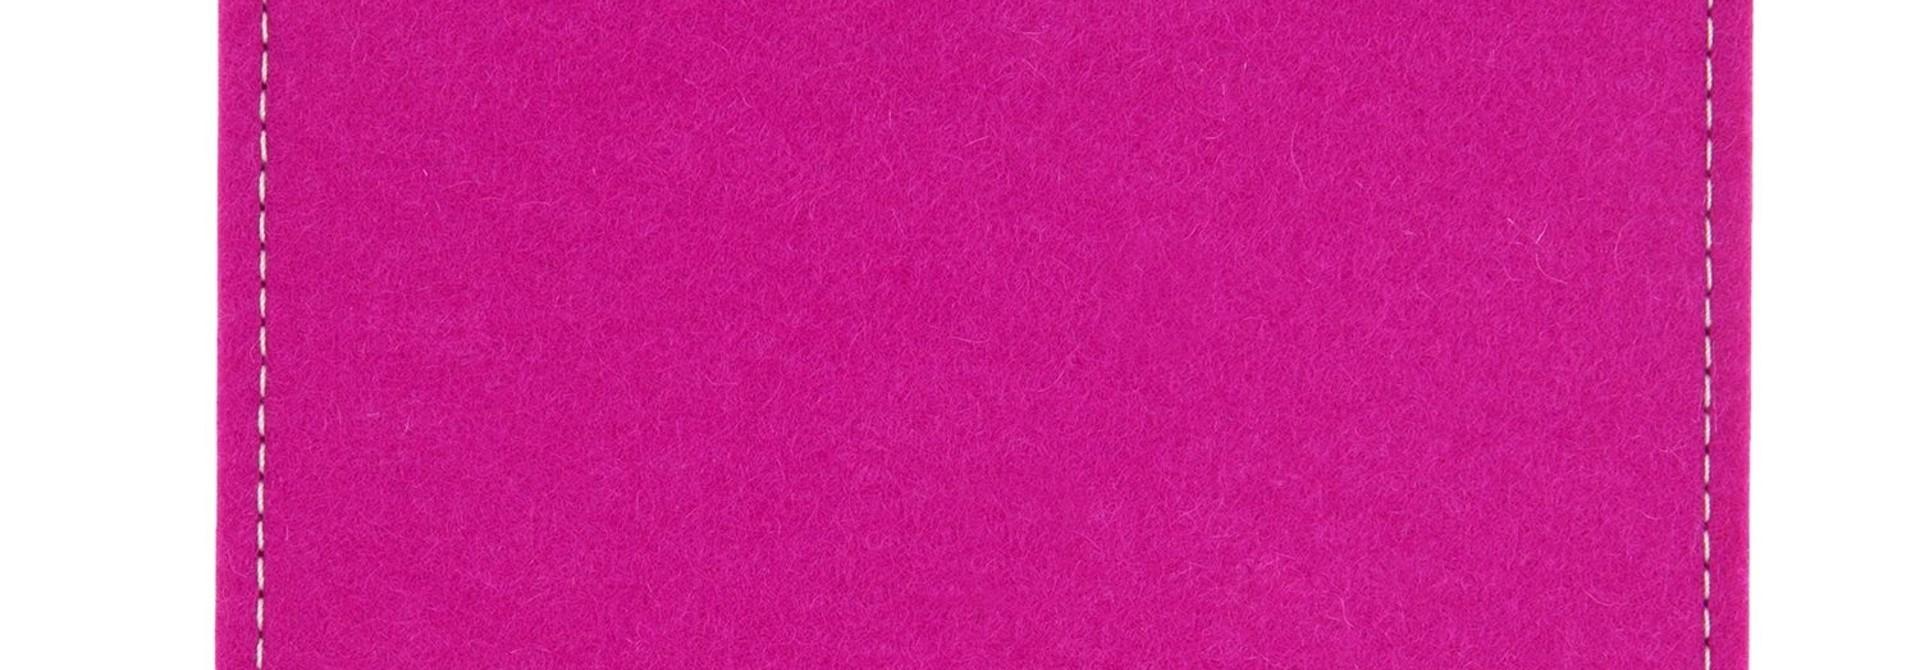 Vision/Page/Shine/Epos Sleeve Pink